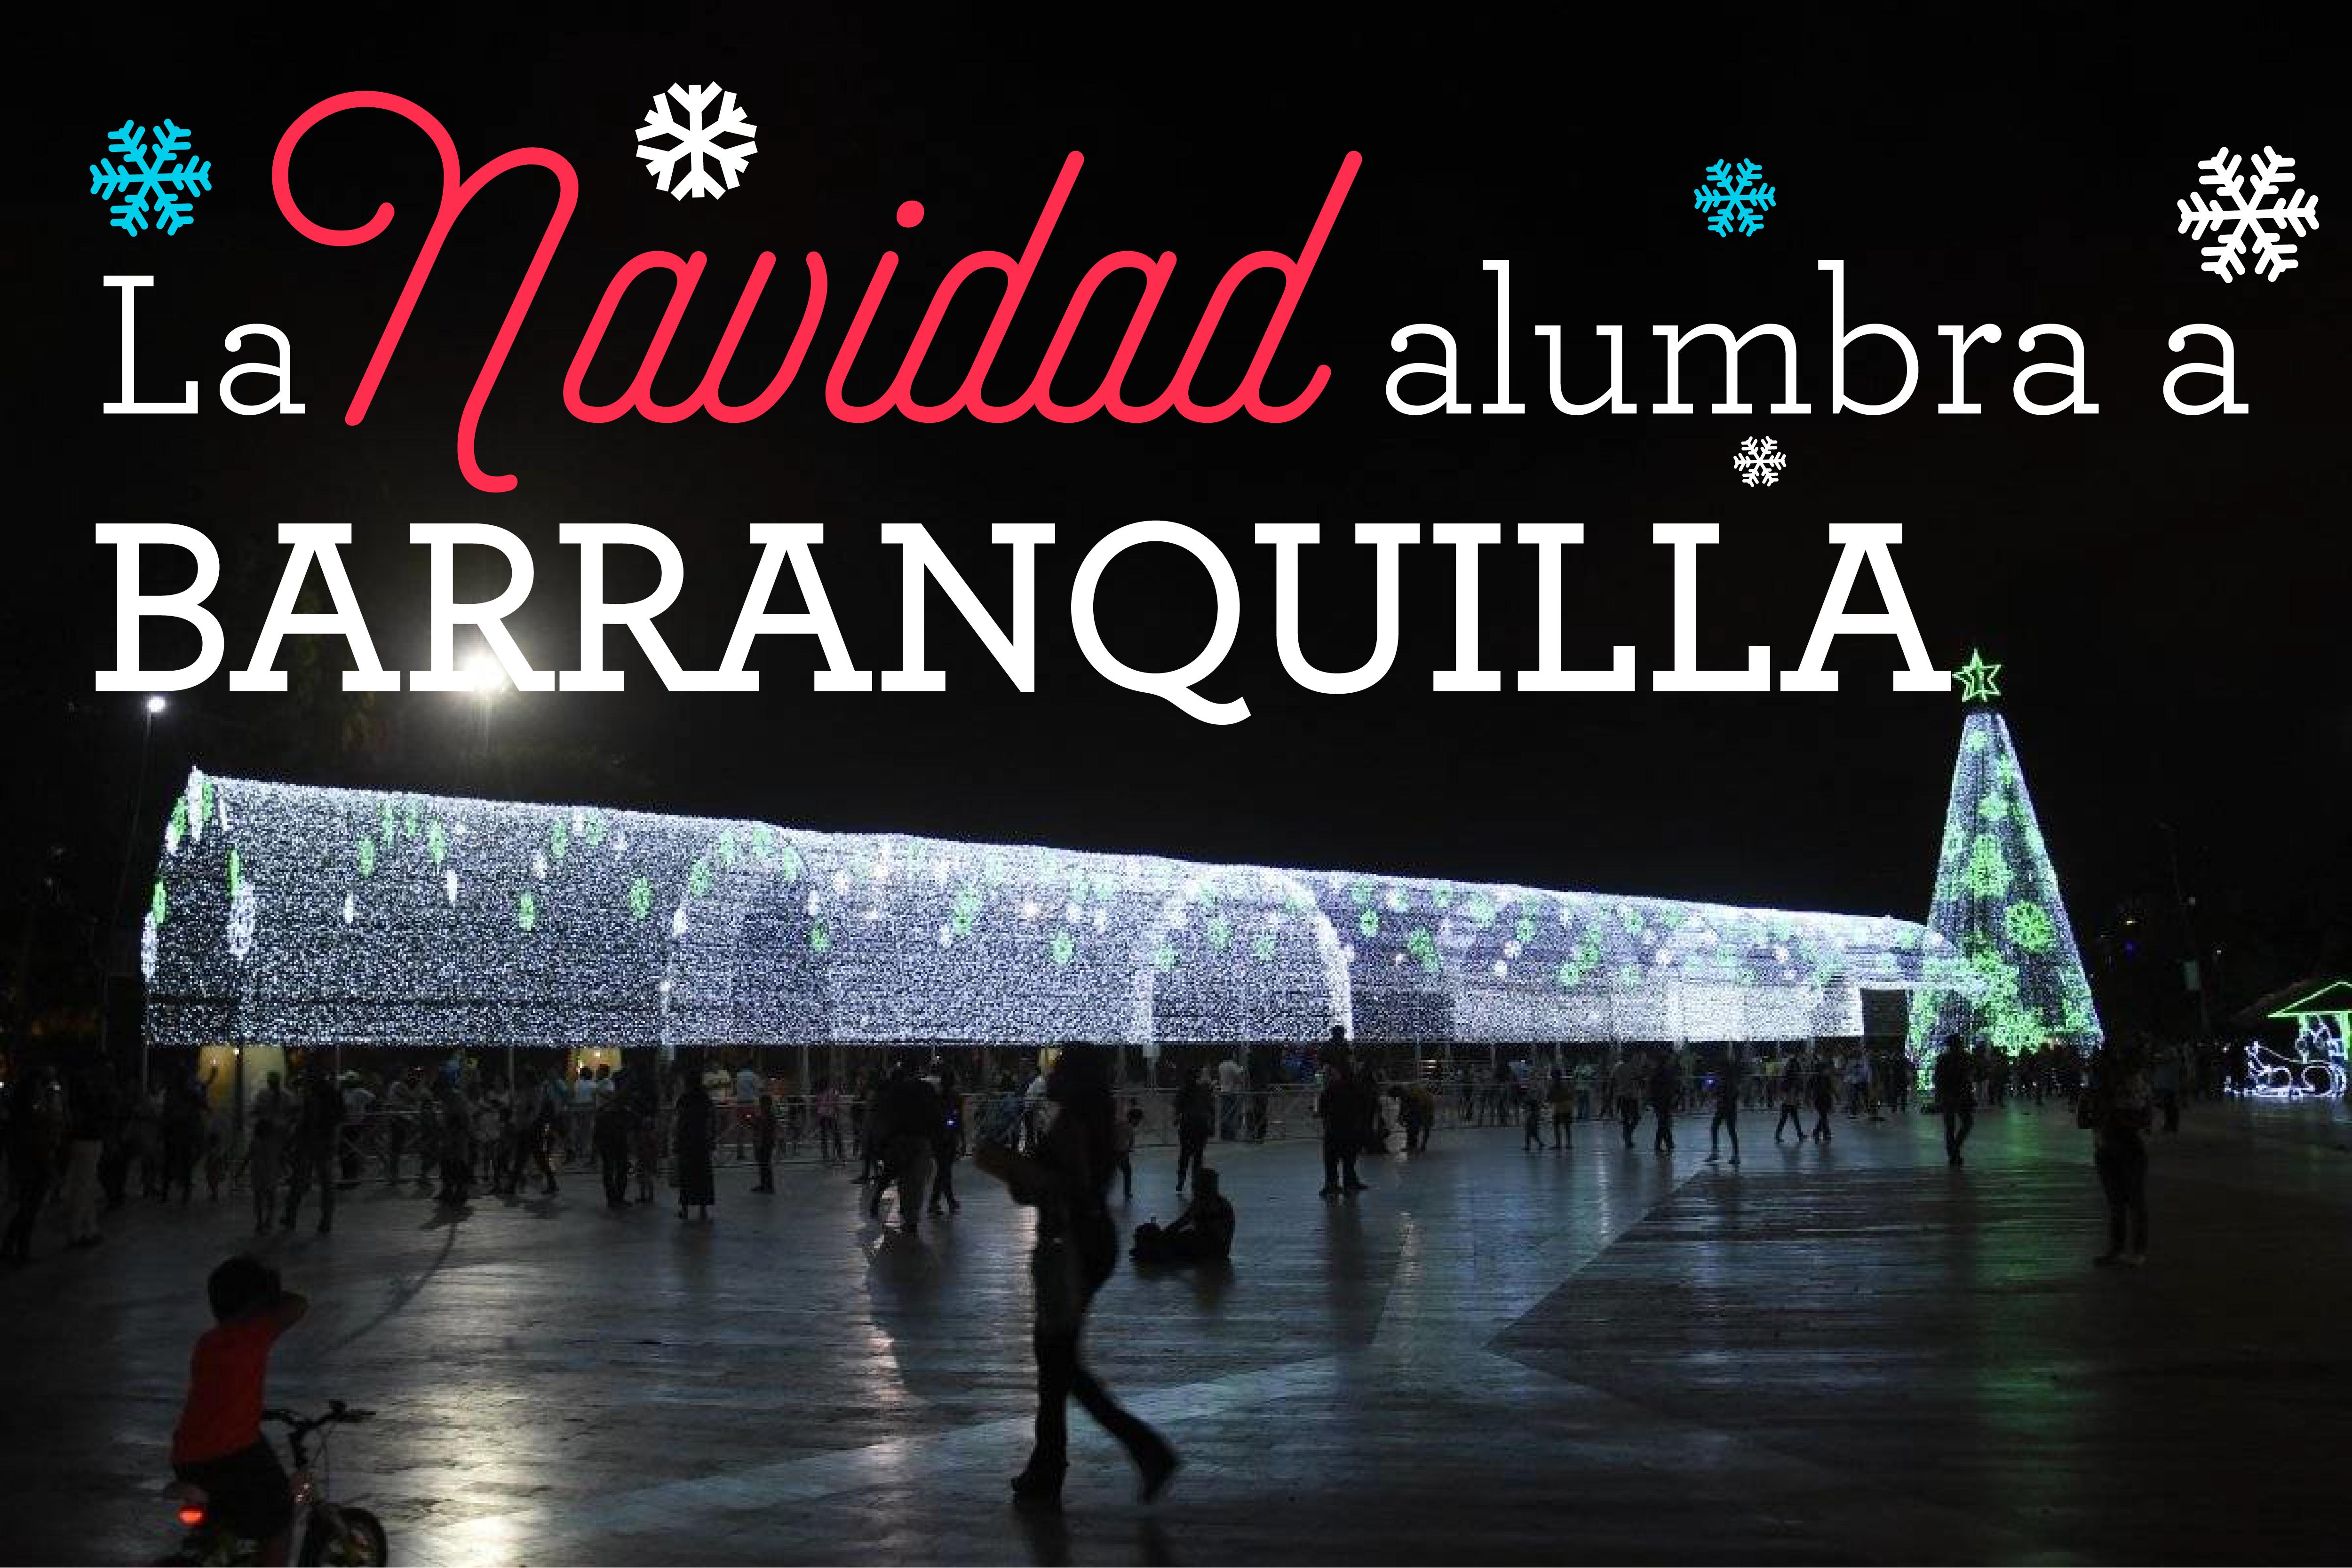 Barranquilla en navidad